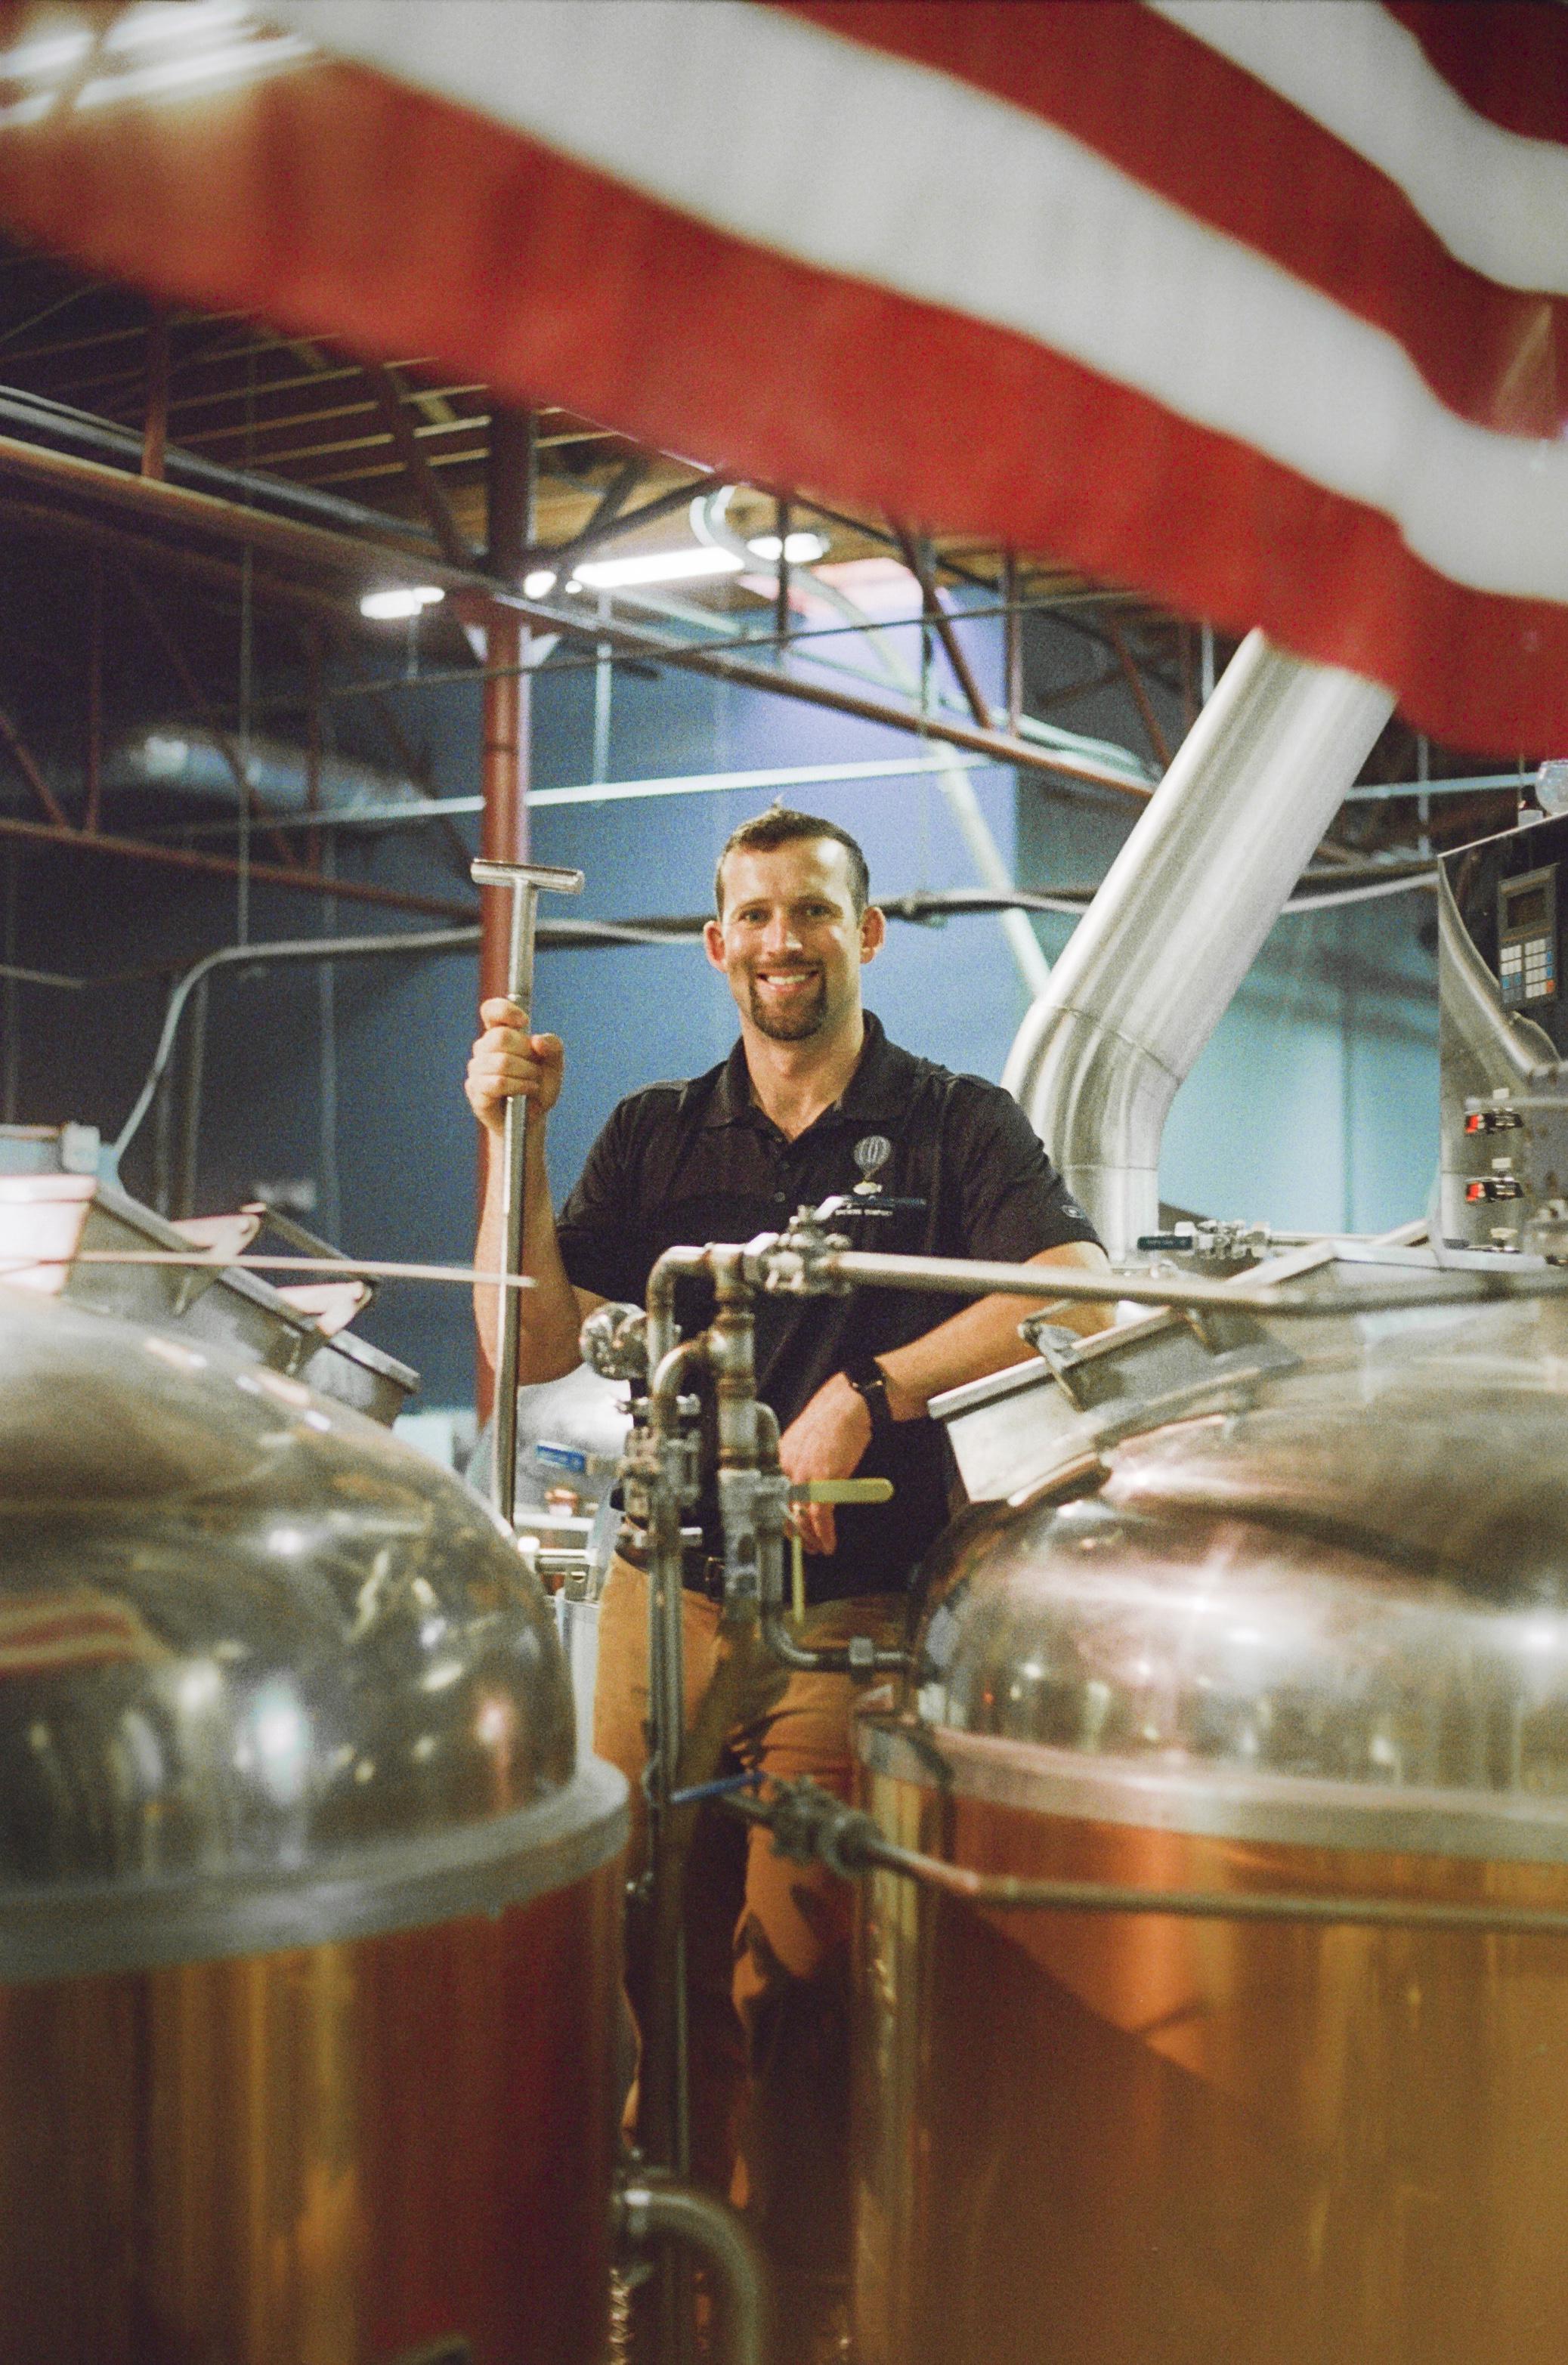 Joe Vogelbacher, Founder and CEO of Sugar Creek Brewing Co.